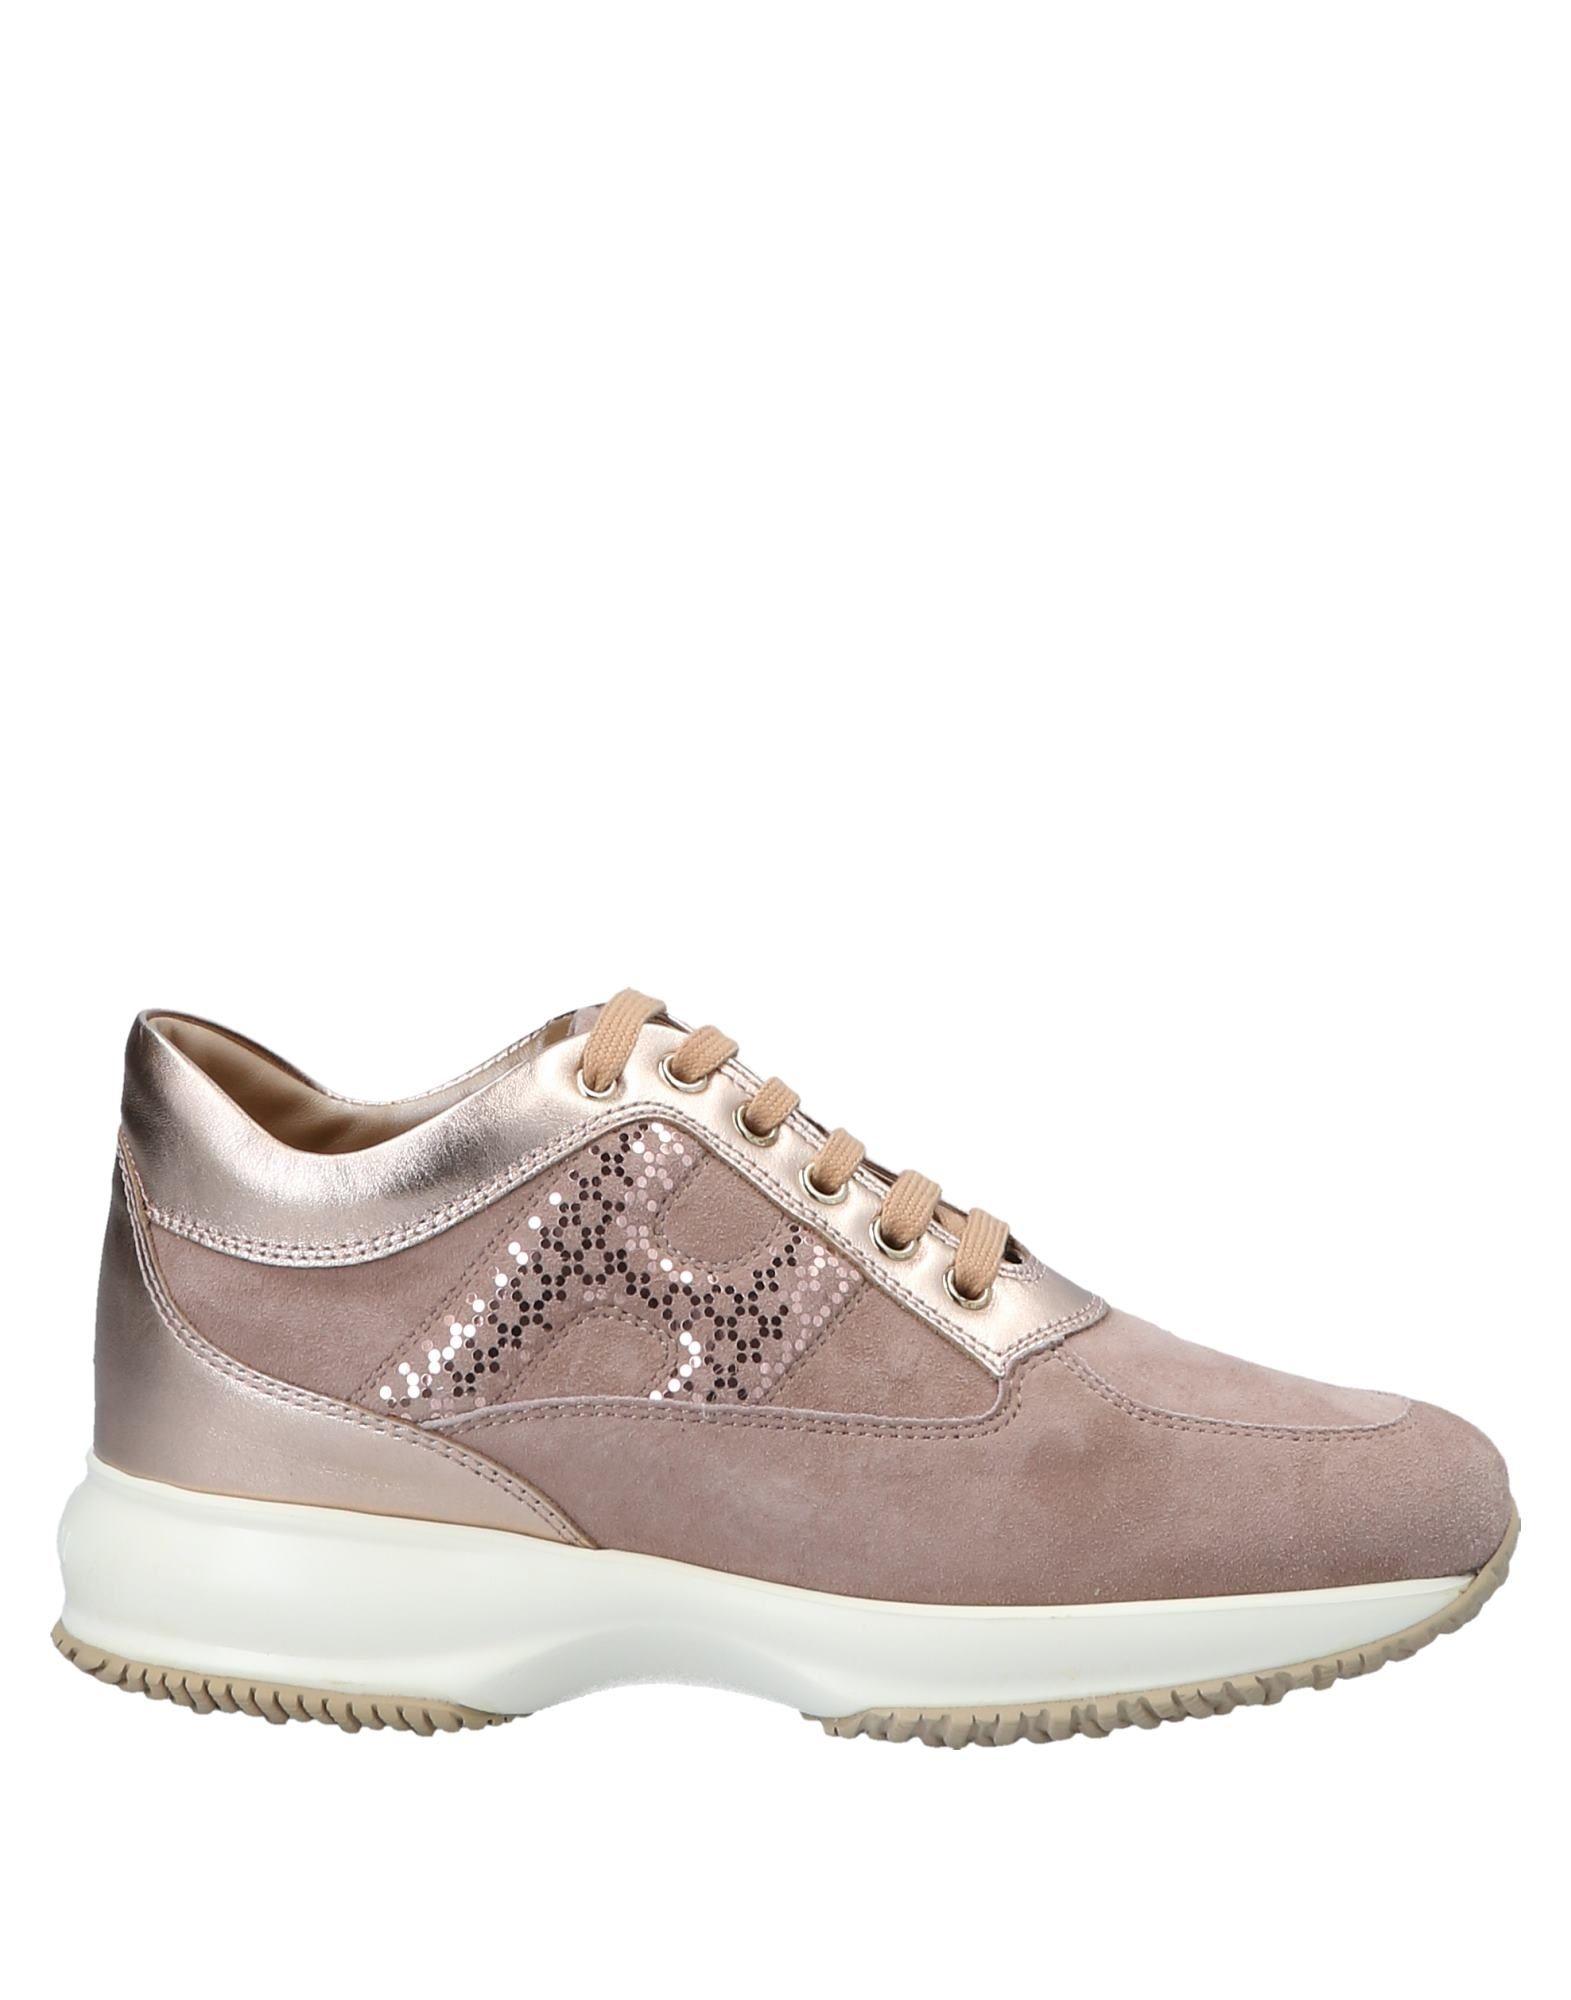 Hogan Sneakers Damen  11494602AWGut aussehende strapazierfähige Schuhe